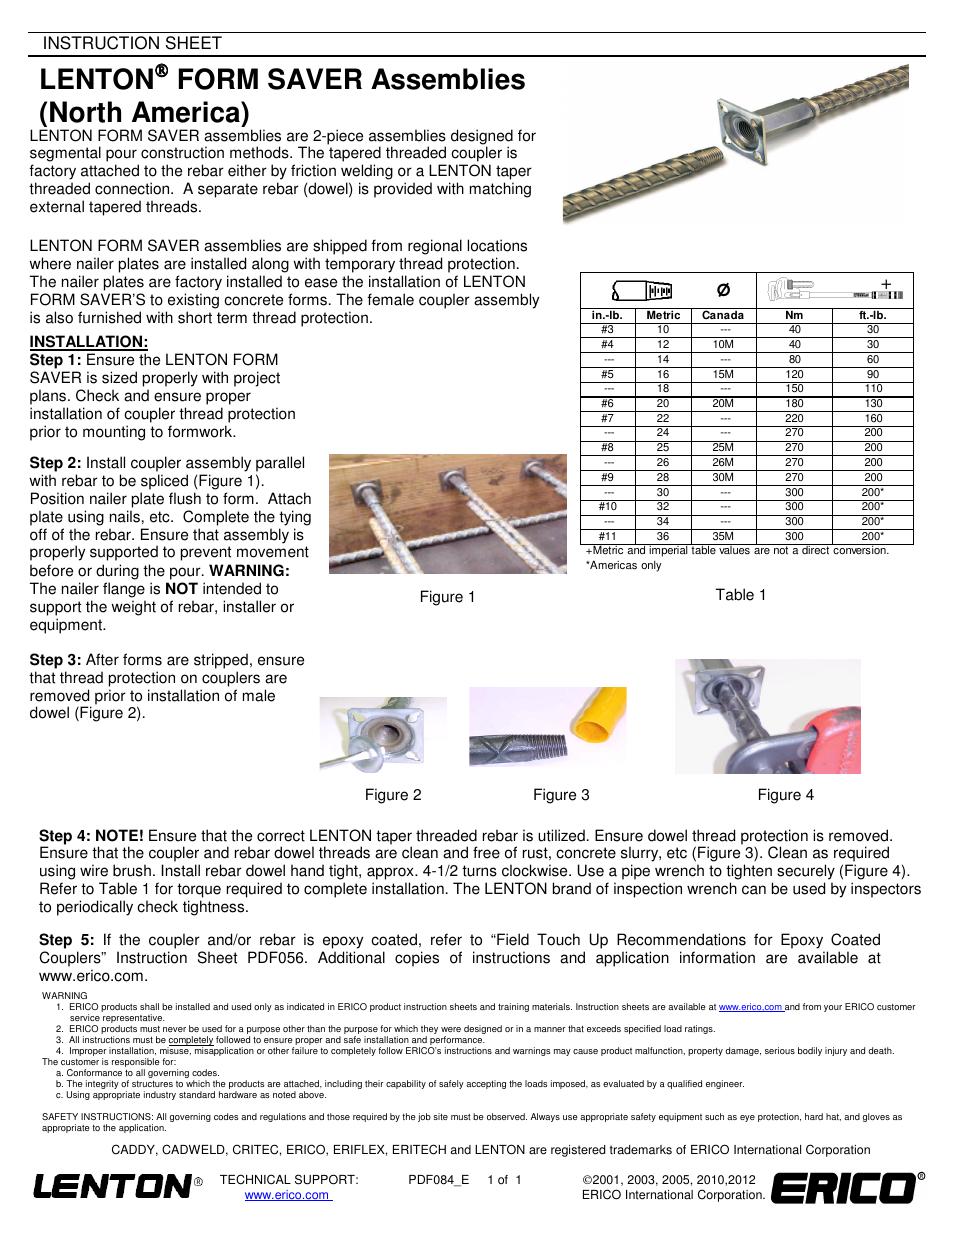 ERICO LENTON FORM SAVER Assemblies User Manual | 1 page